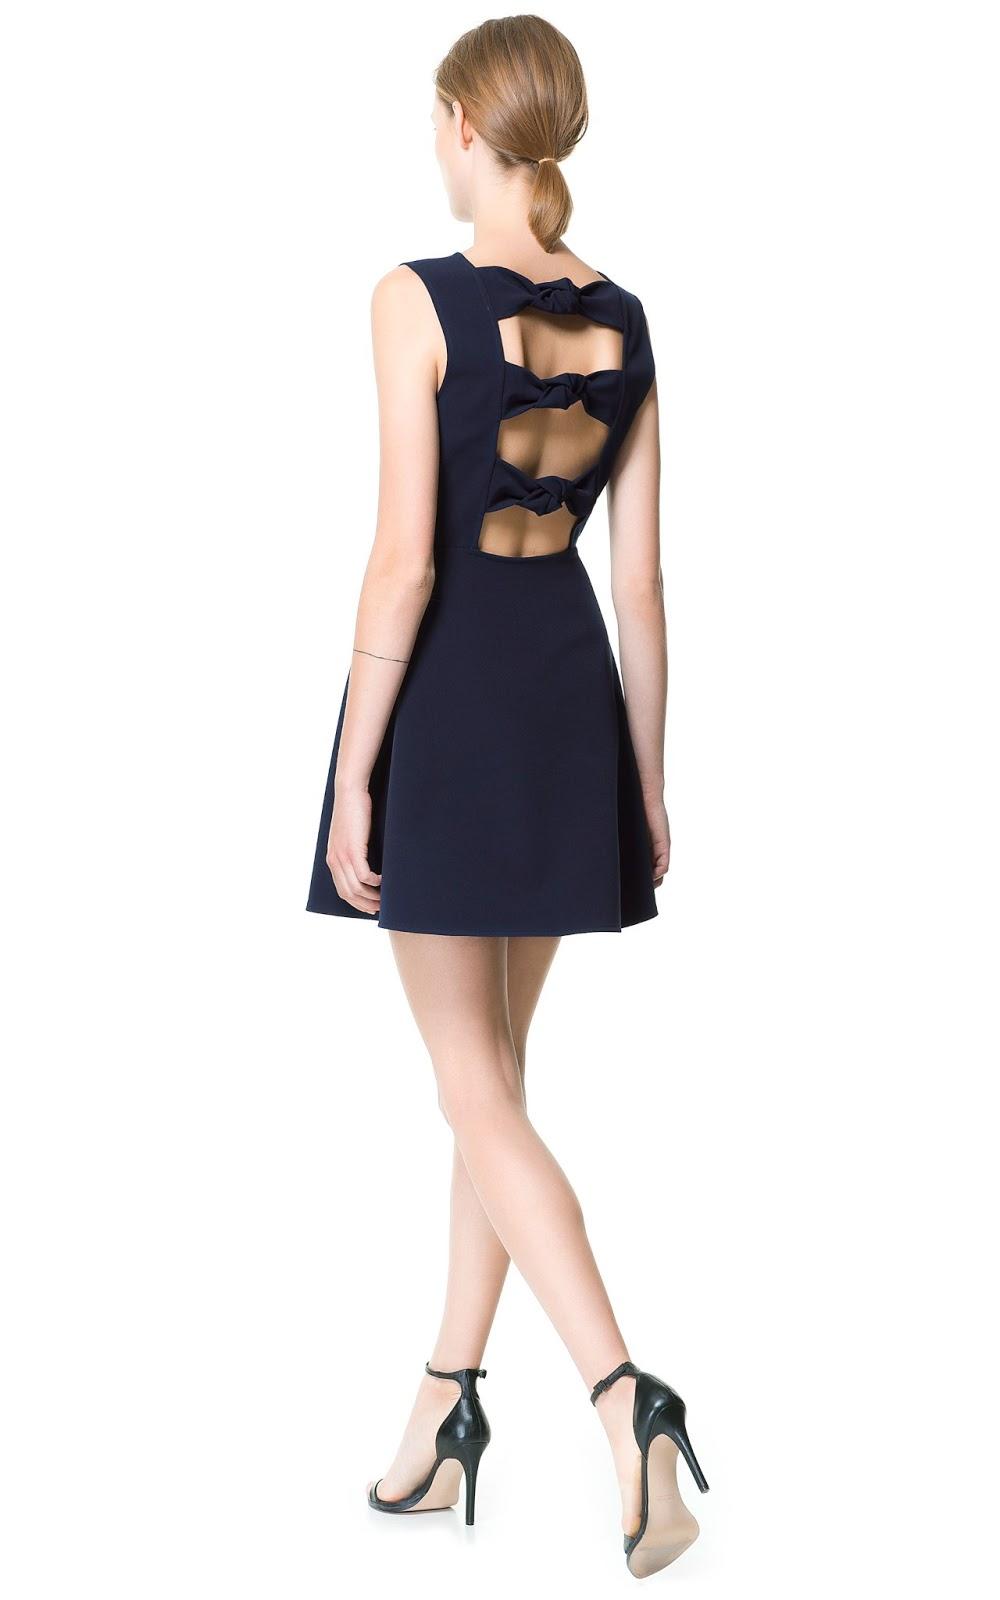 Vestido Preto com Babados | Vestido Feminino Zara Usado 33875999 | enjoei